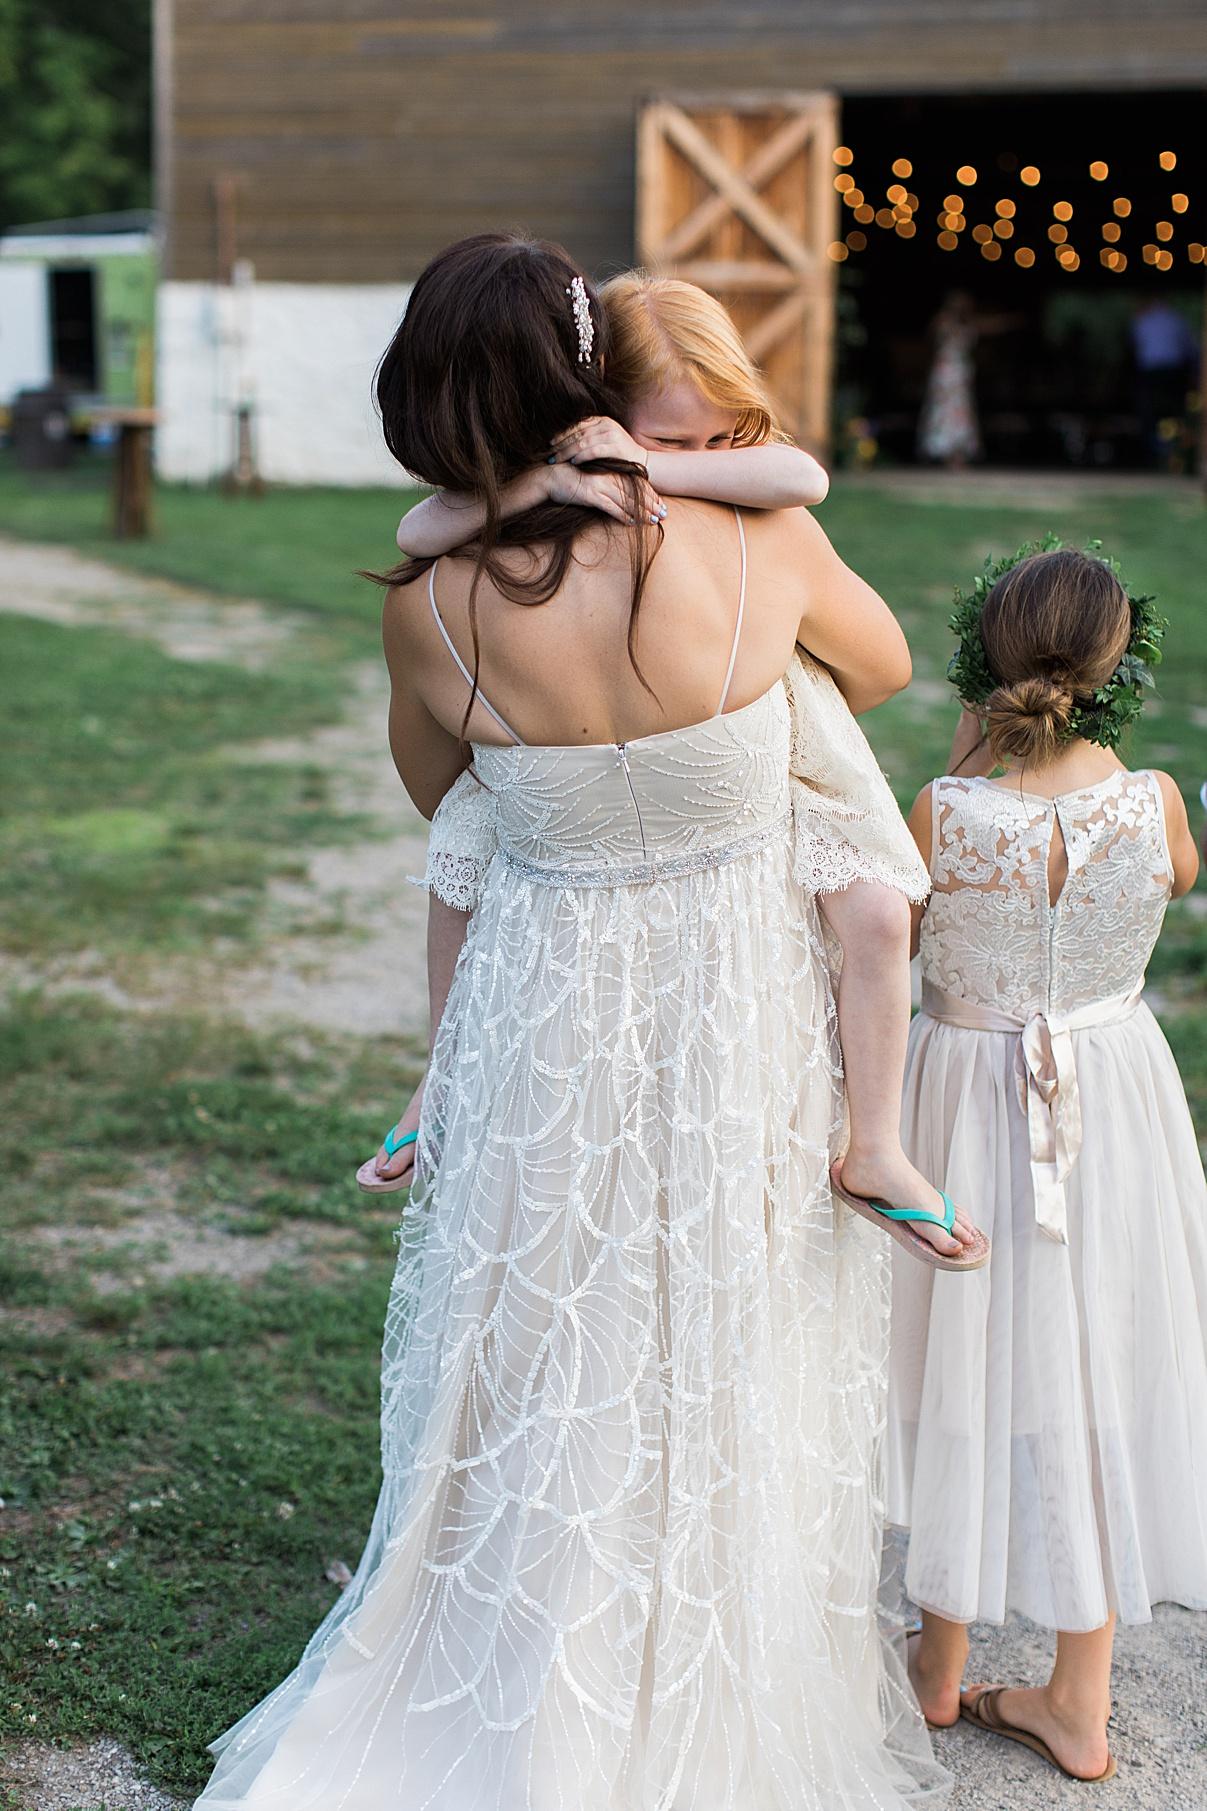 Bride walking while holding flower girl | Balls Falls, Ontario Wedding| Ontario Wedding Photographer| Toronto Wedding Photographer| 3Photography| 3photography.ca